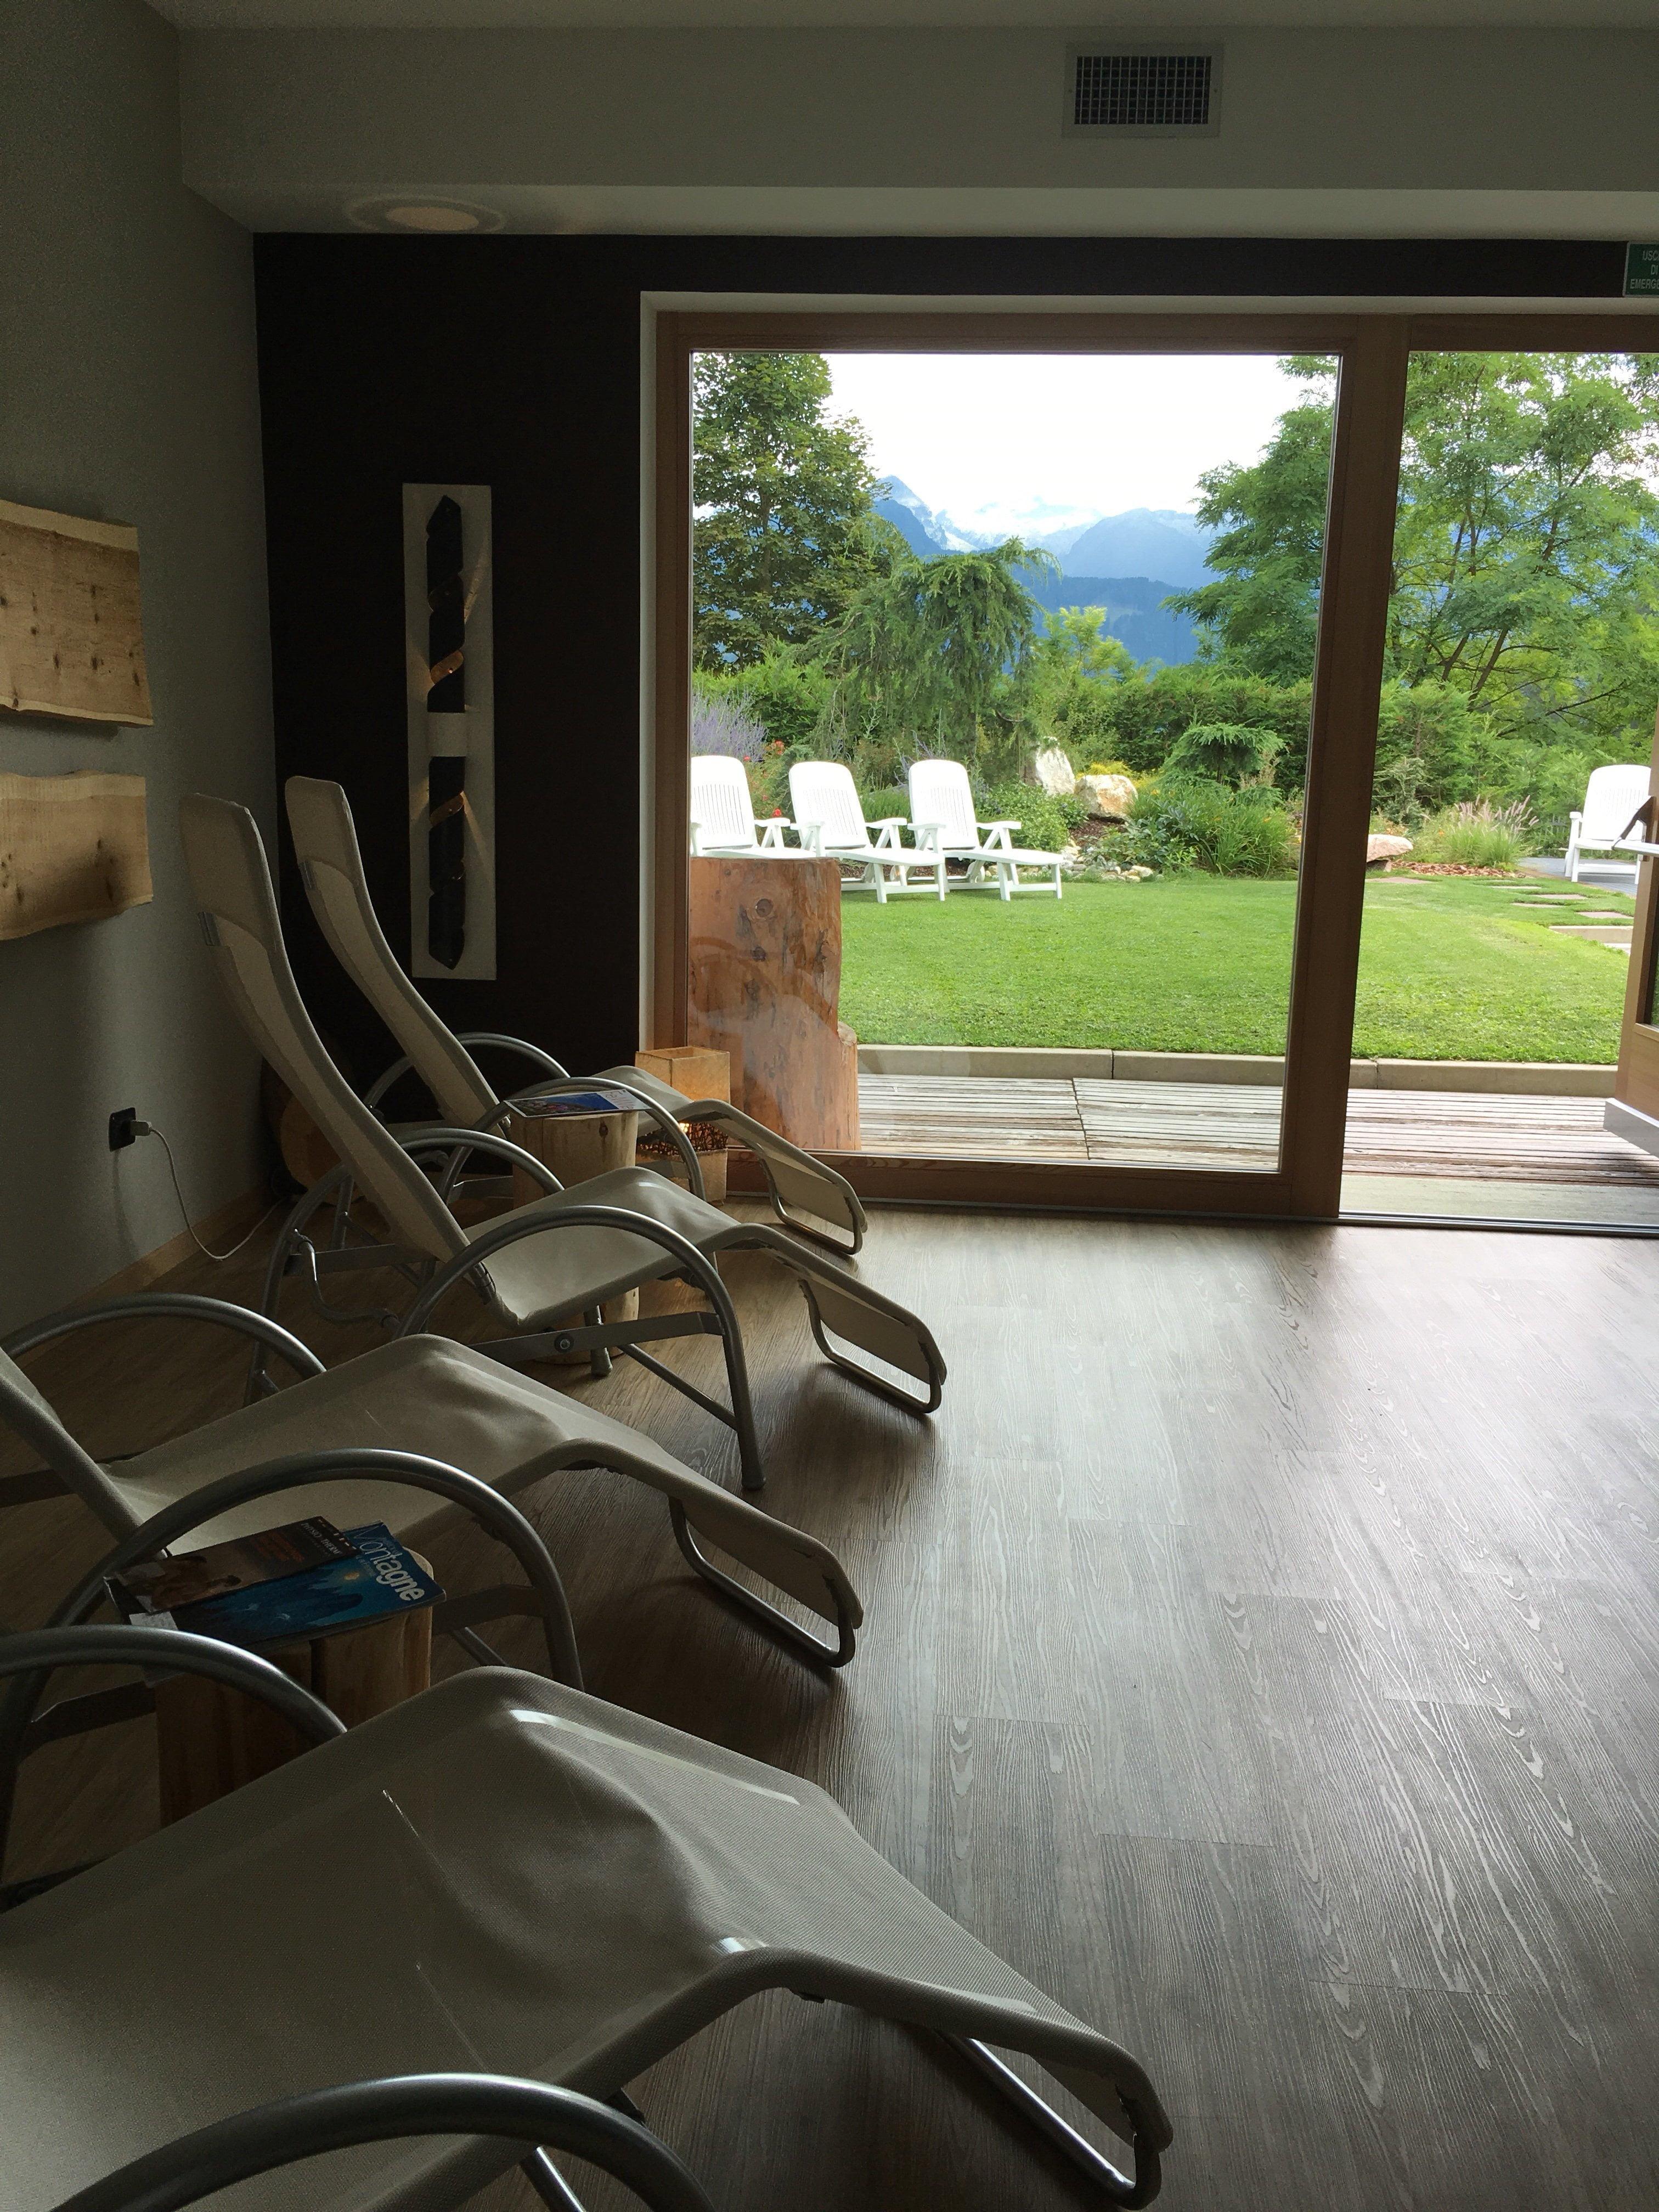 Dove rilassarsi a Tesero: Hotel Erica